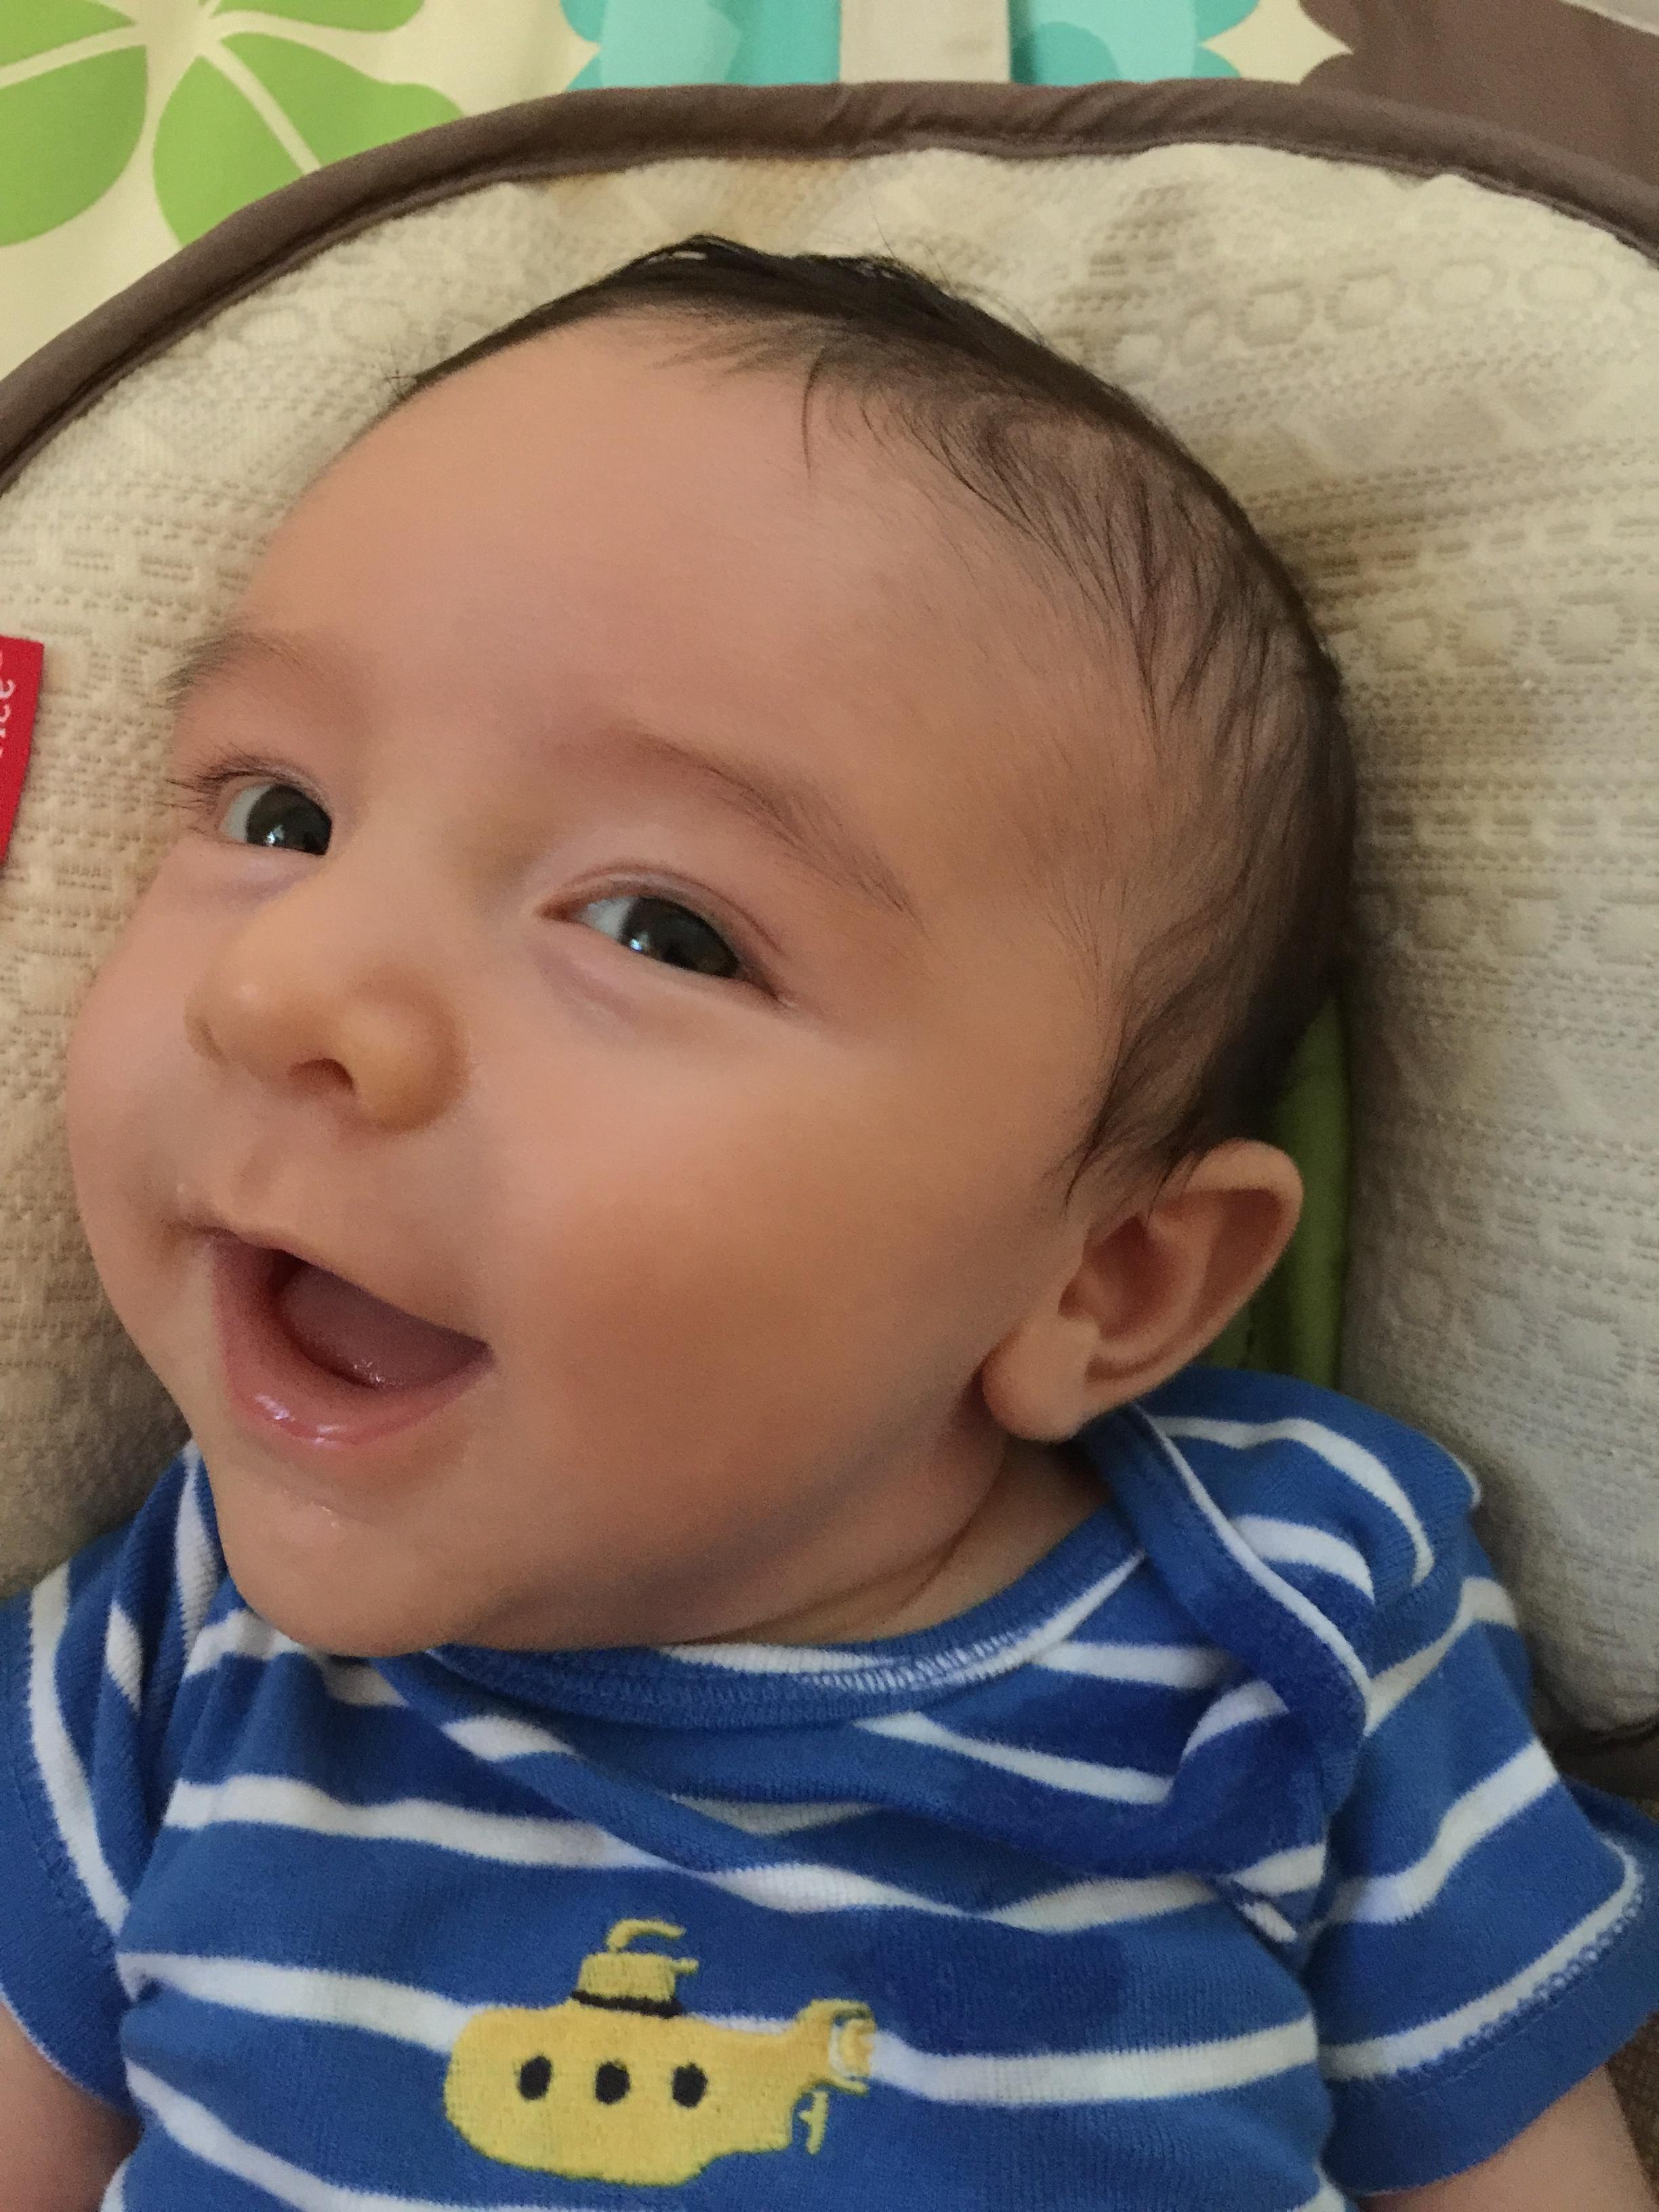 Caleb 2 months old